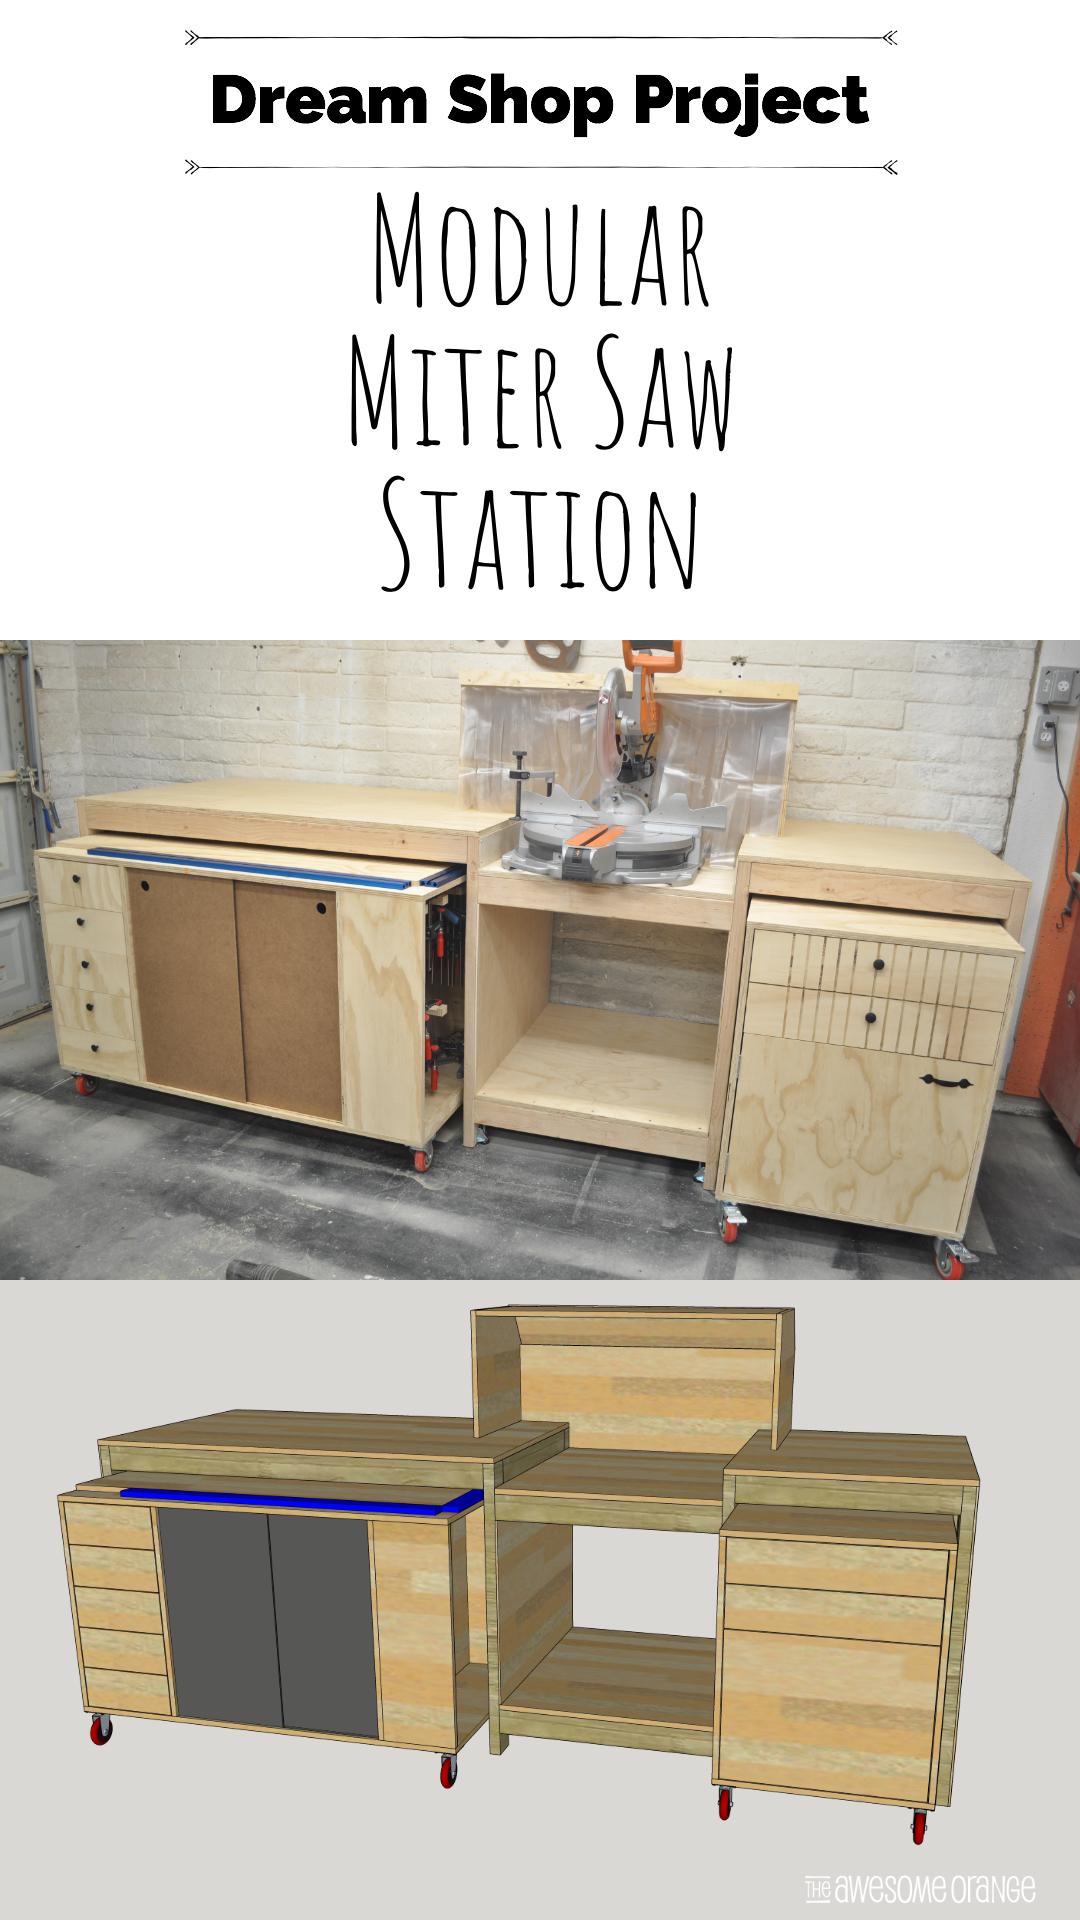 Modular Miter Station - Pinterest Image.jpg